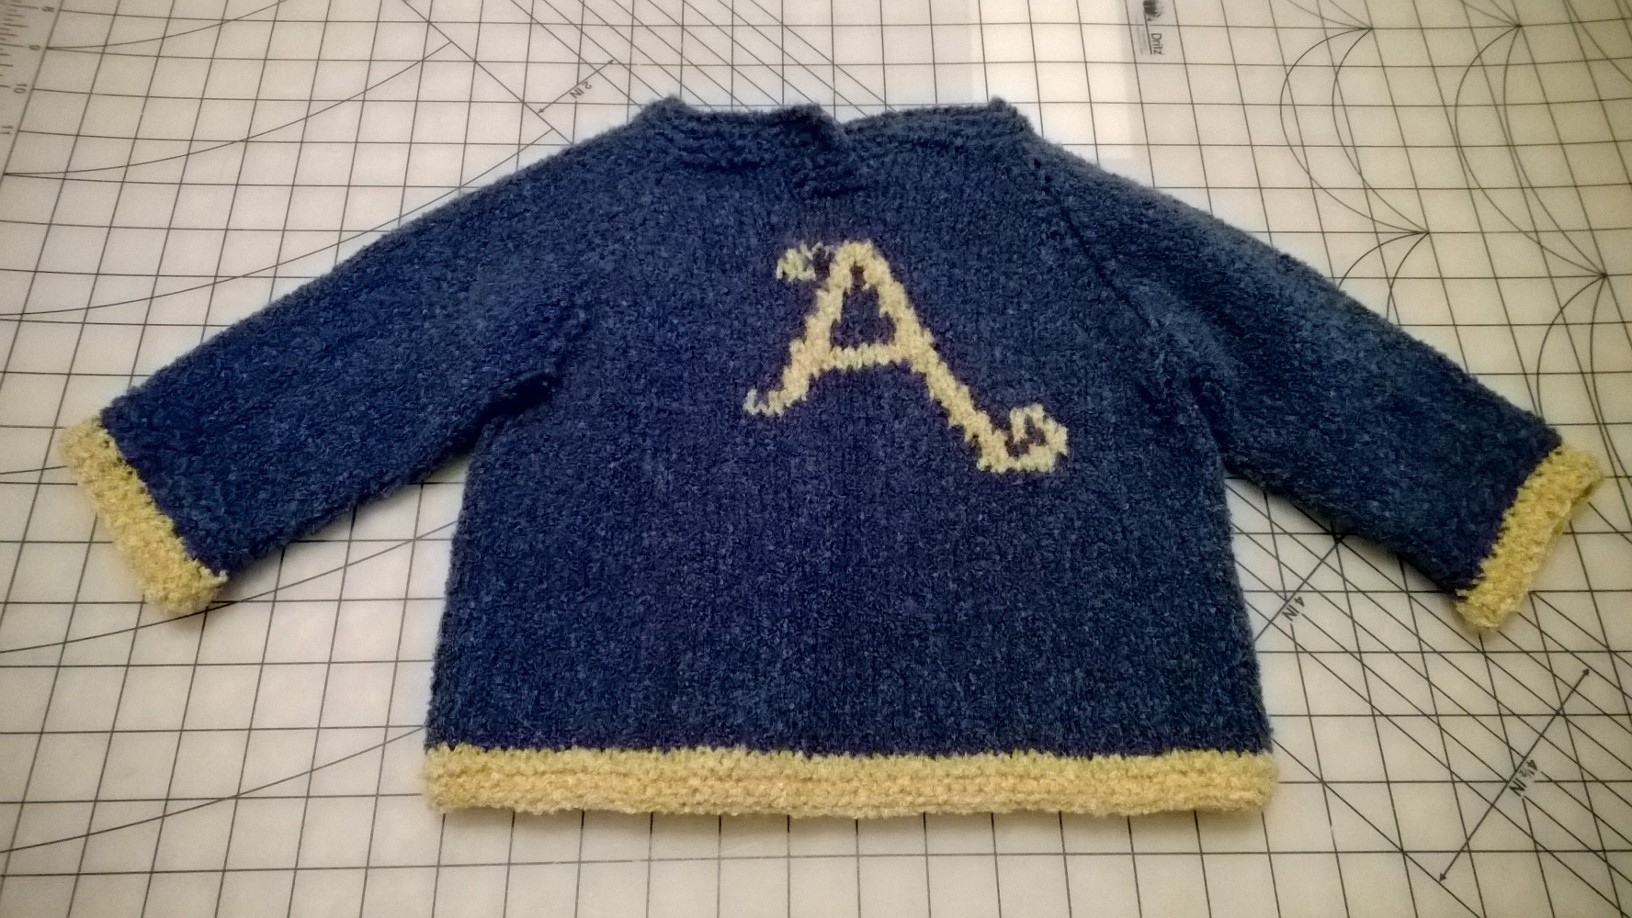 Harry Potter Knits – DIY Weasley Sweater | girlsvsblog